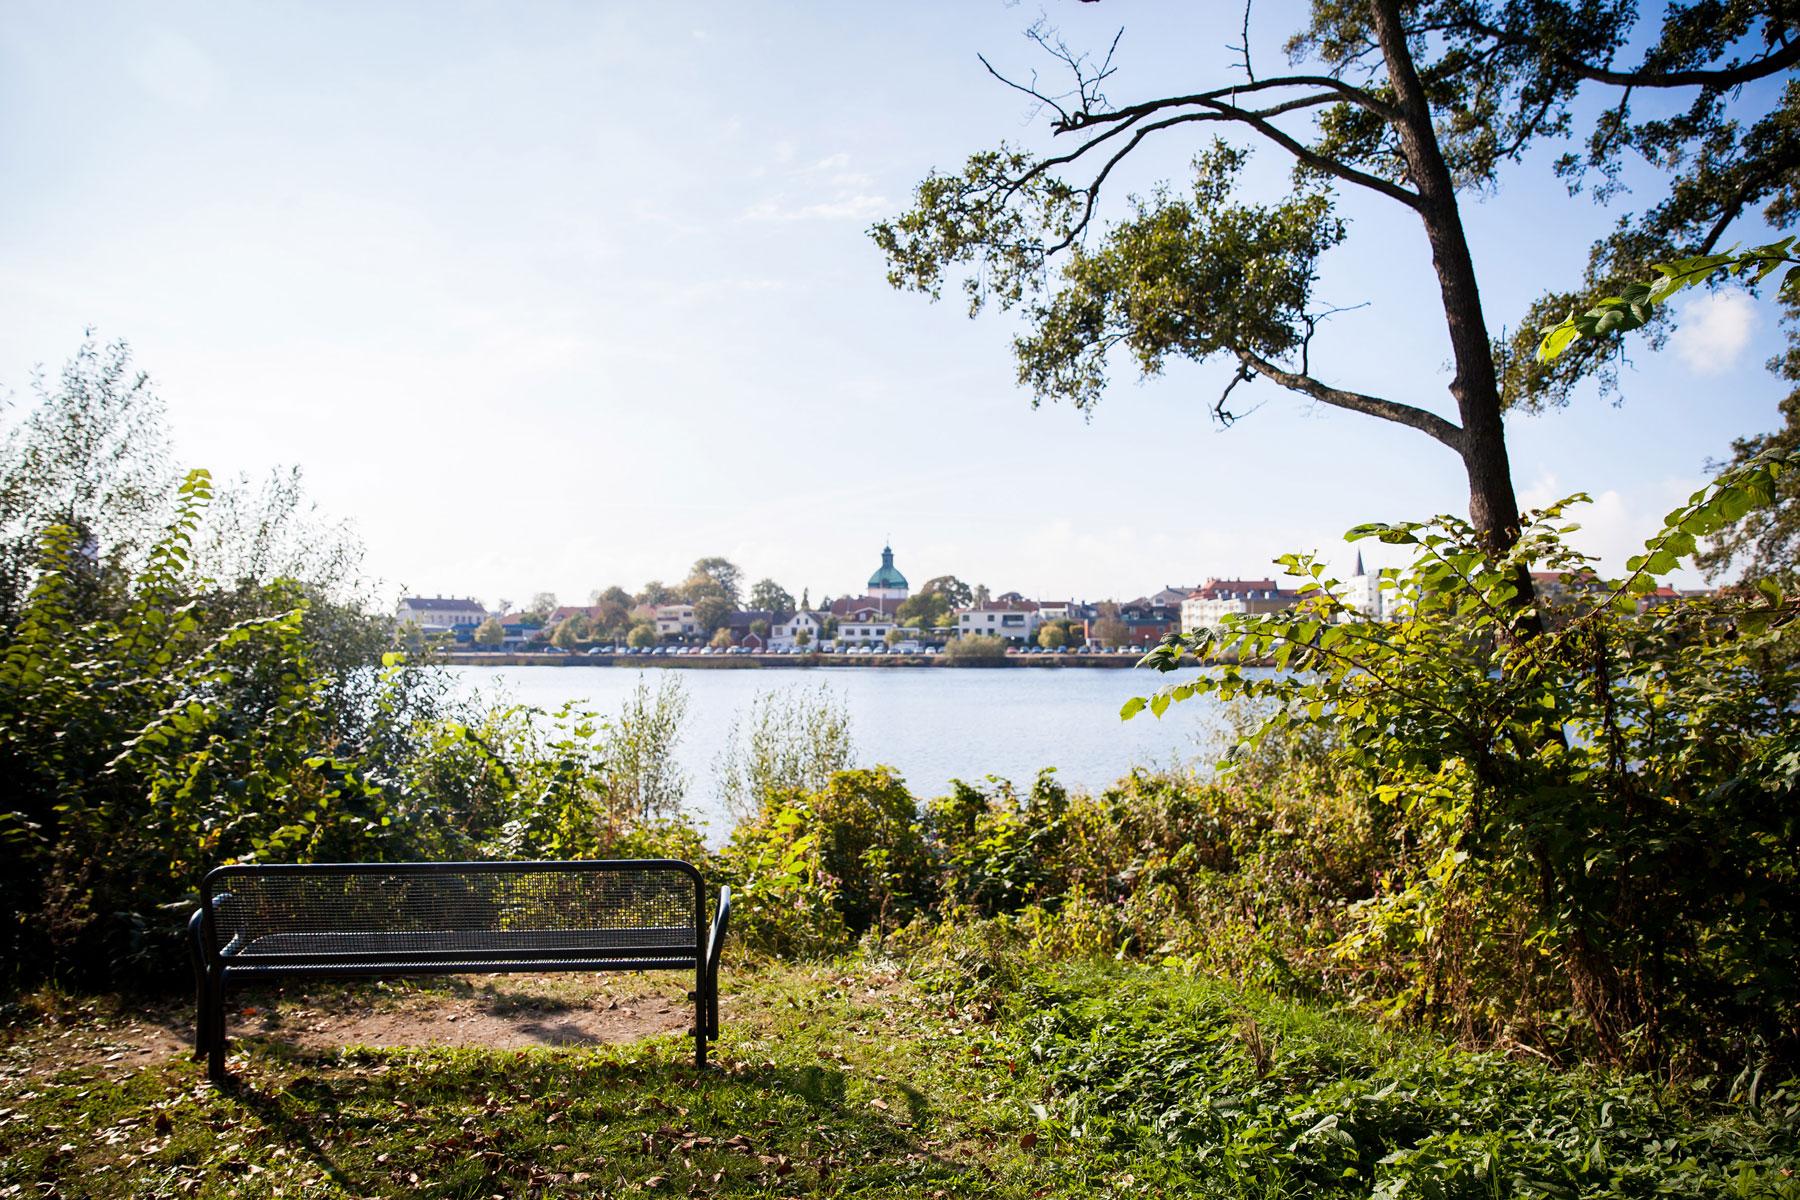 Staden vid havet - Falkenberg